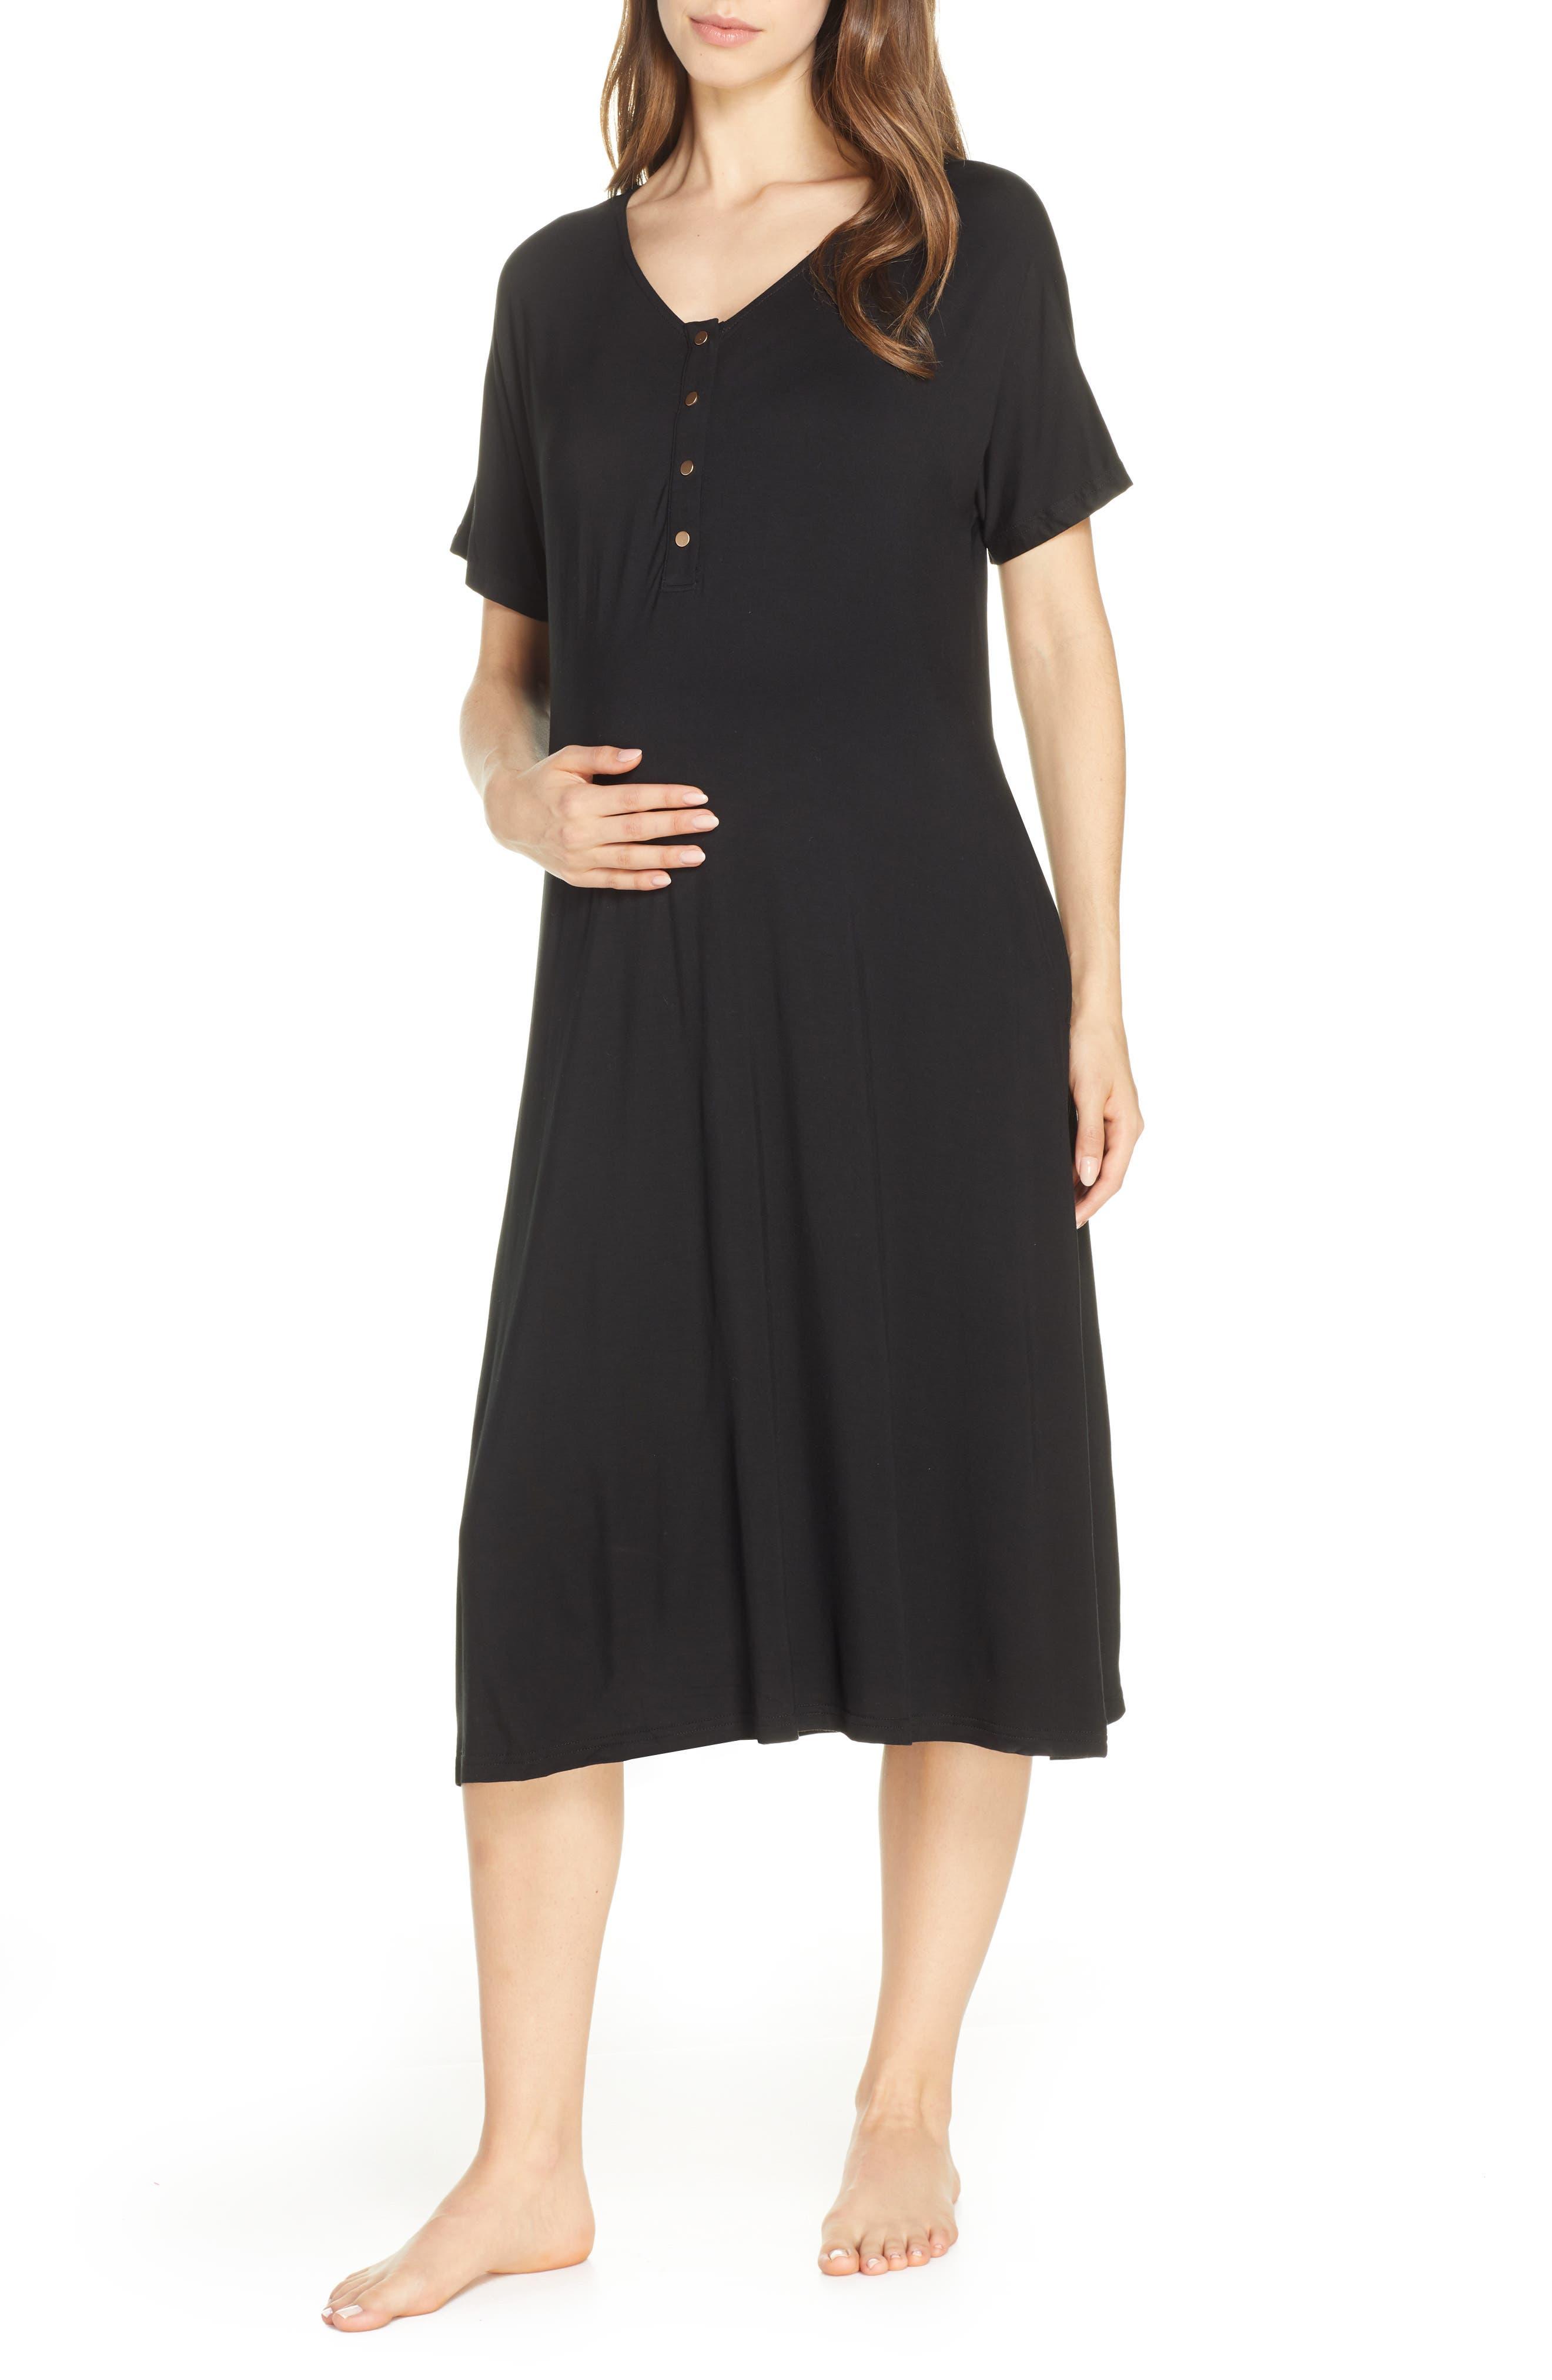 Nesting Olive Solid Maternity/nursing Sleep Shirt, Black